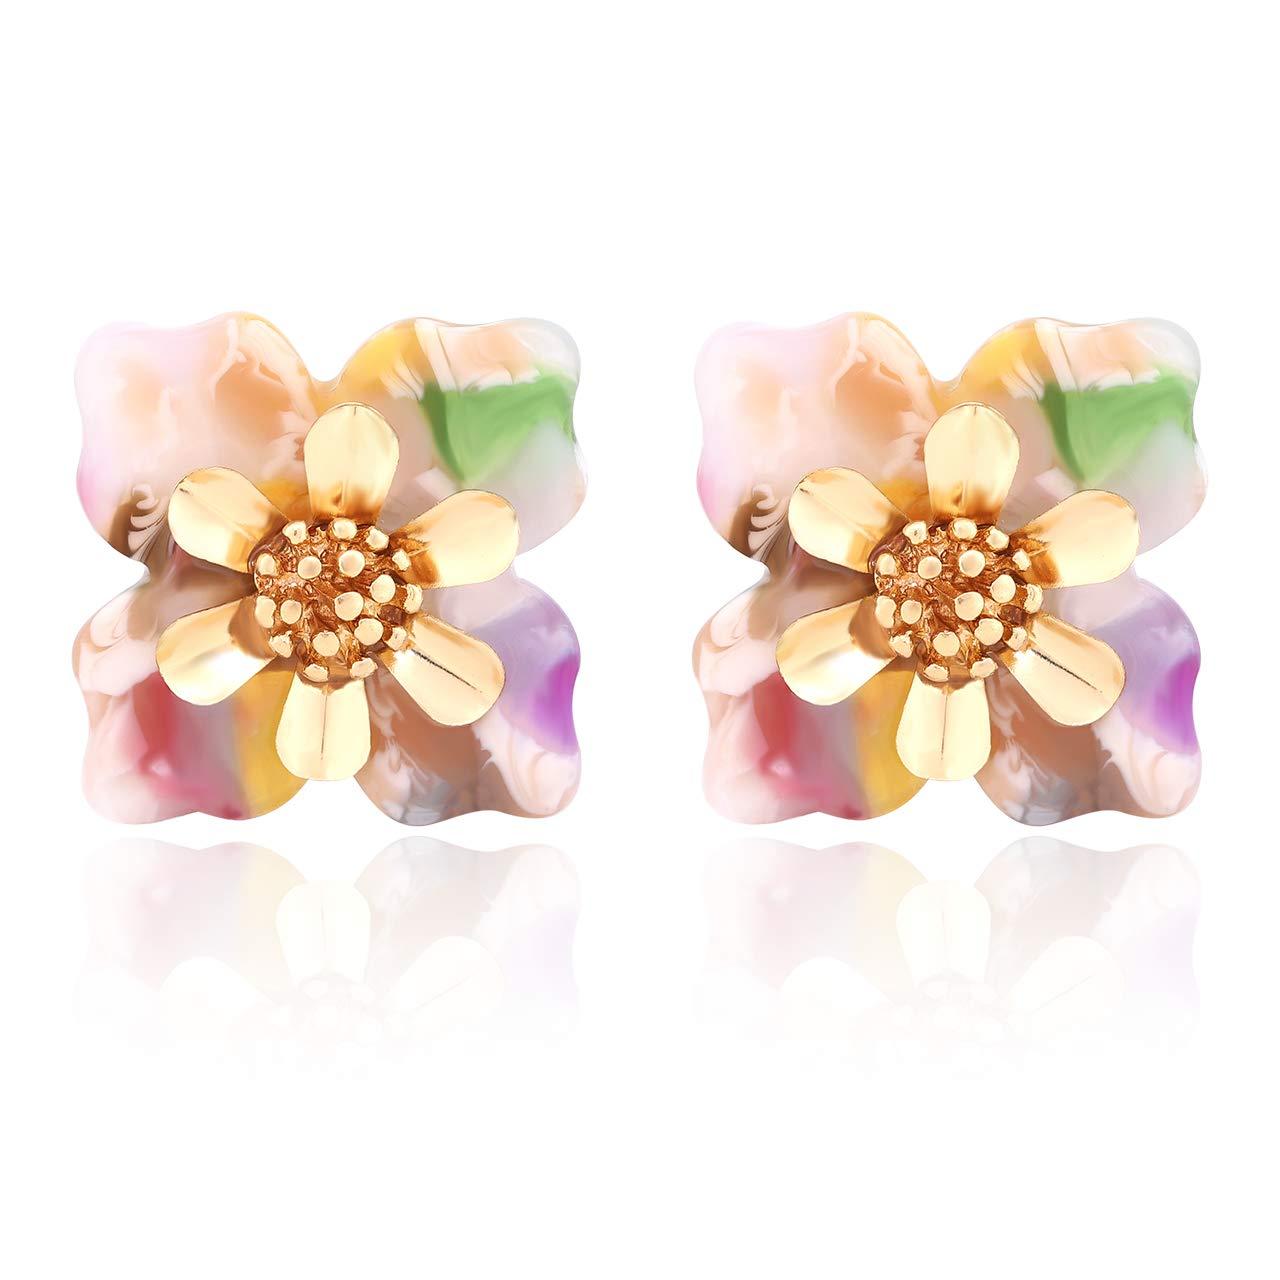 5449f5ba6a6 Amazon.com: Acrylic Resin Vintage Flower Stud Earrings - Geometric 3D  Floral Statement Earring Handmade Lightweight Jewelry for Women (Floral):  Jewelry